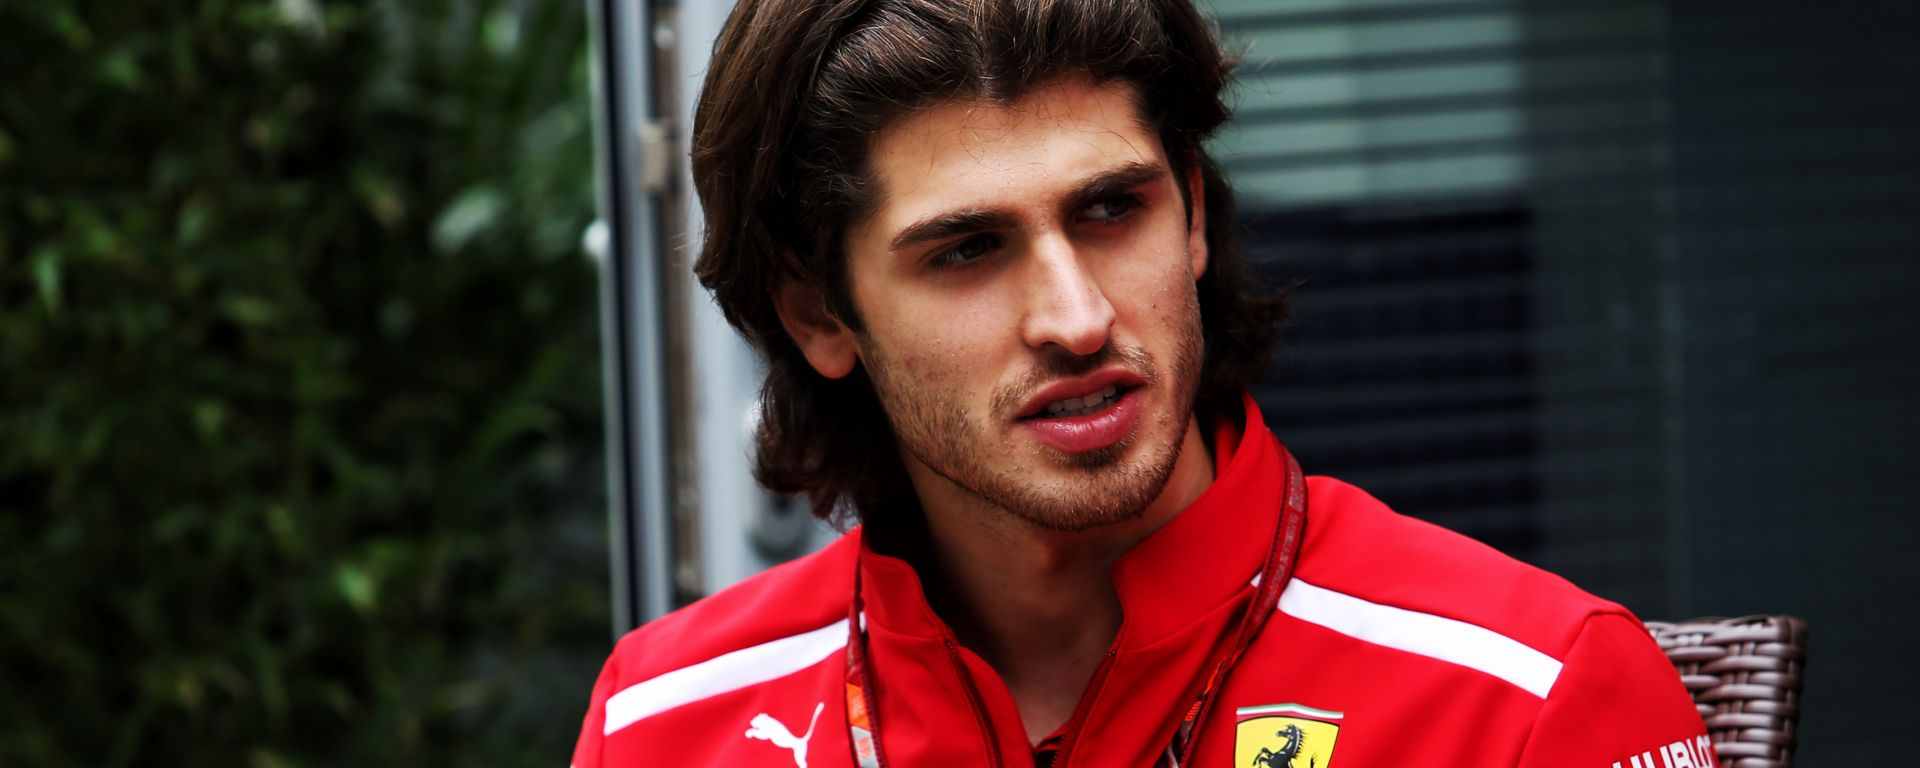 Antonio Giovinazzi (tester Ferrari)